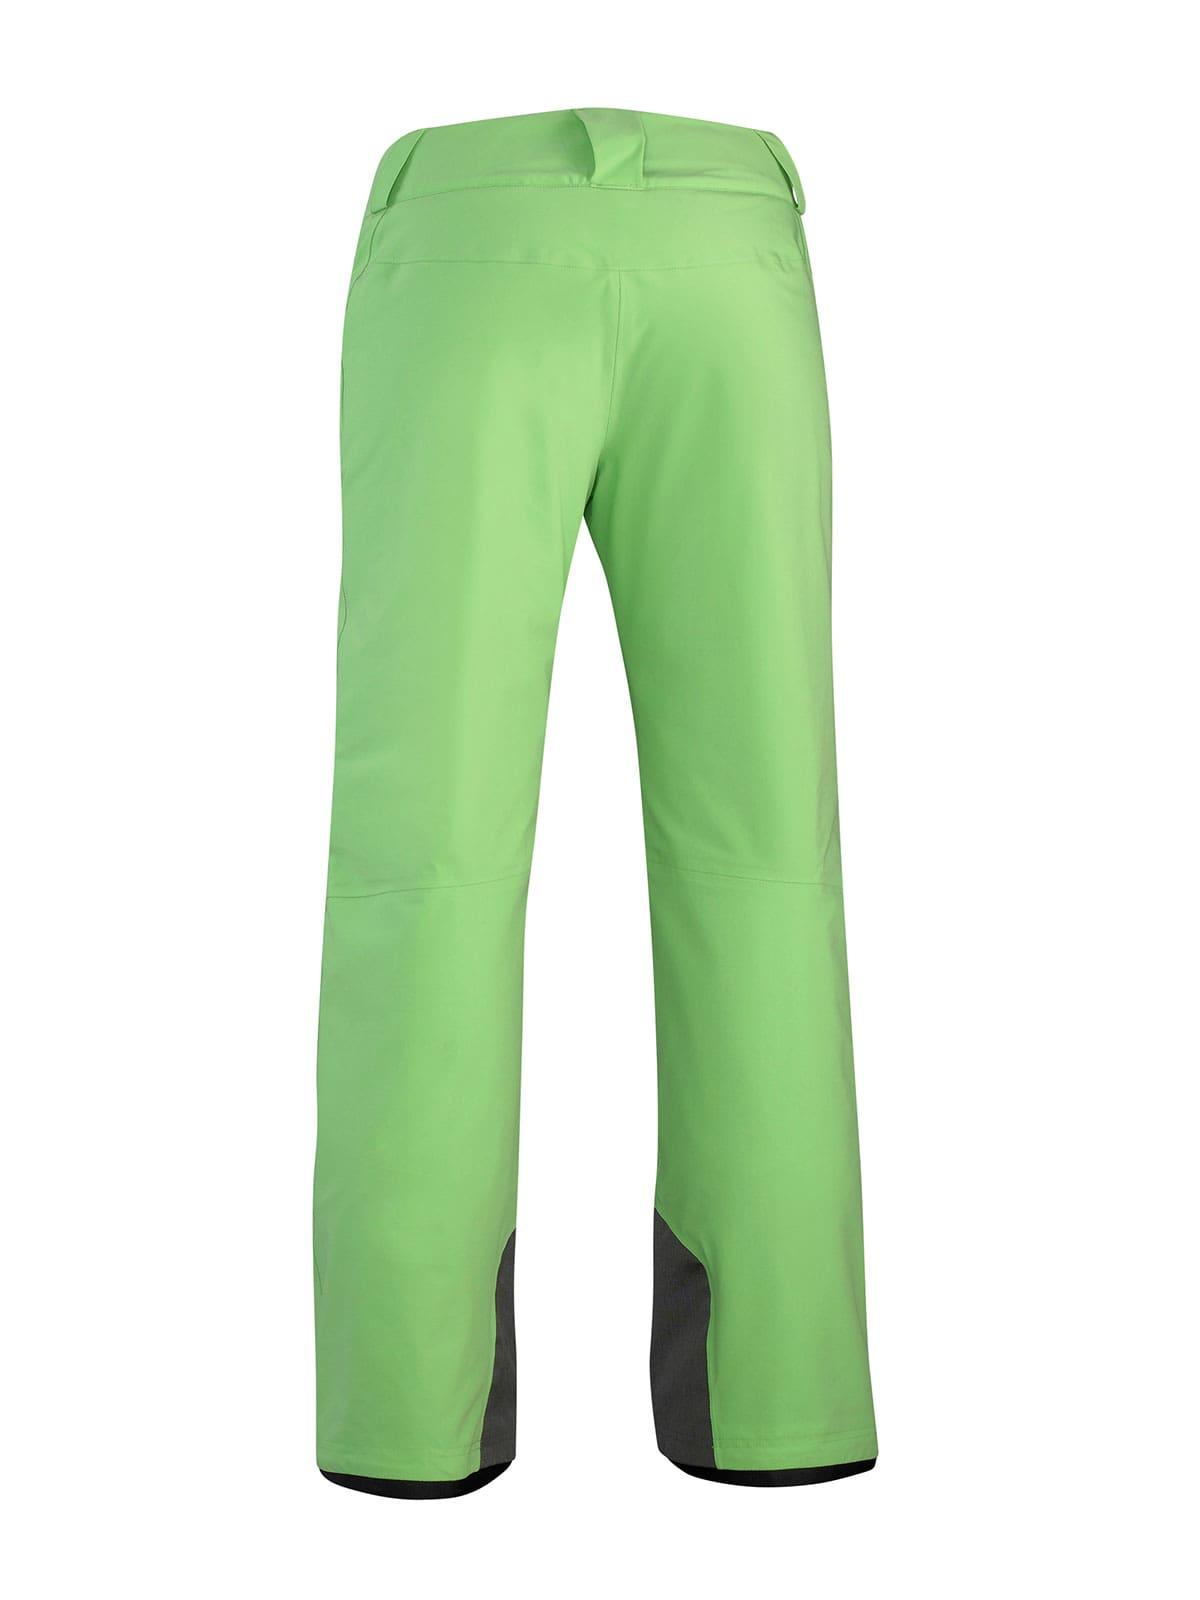 Salomon Brillant skibroek groen